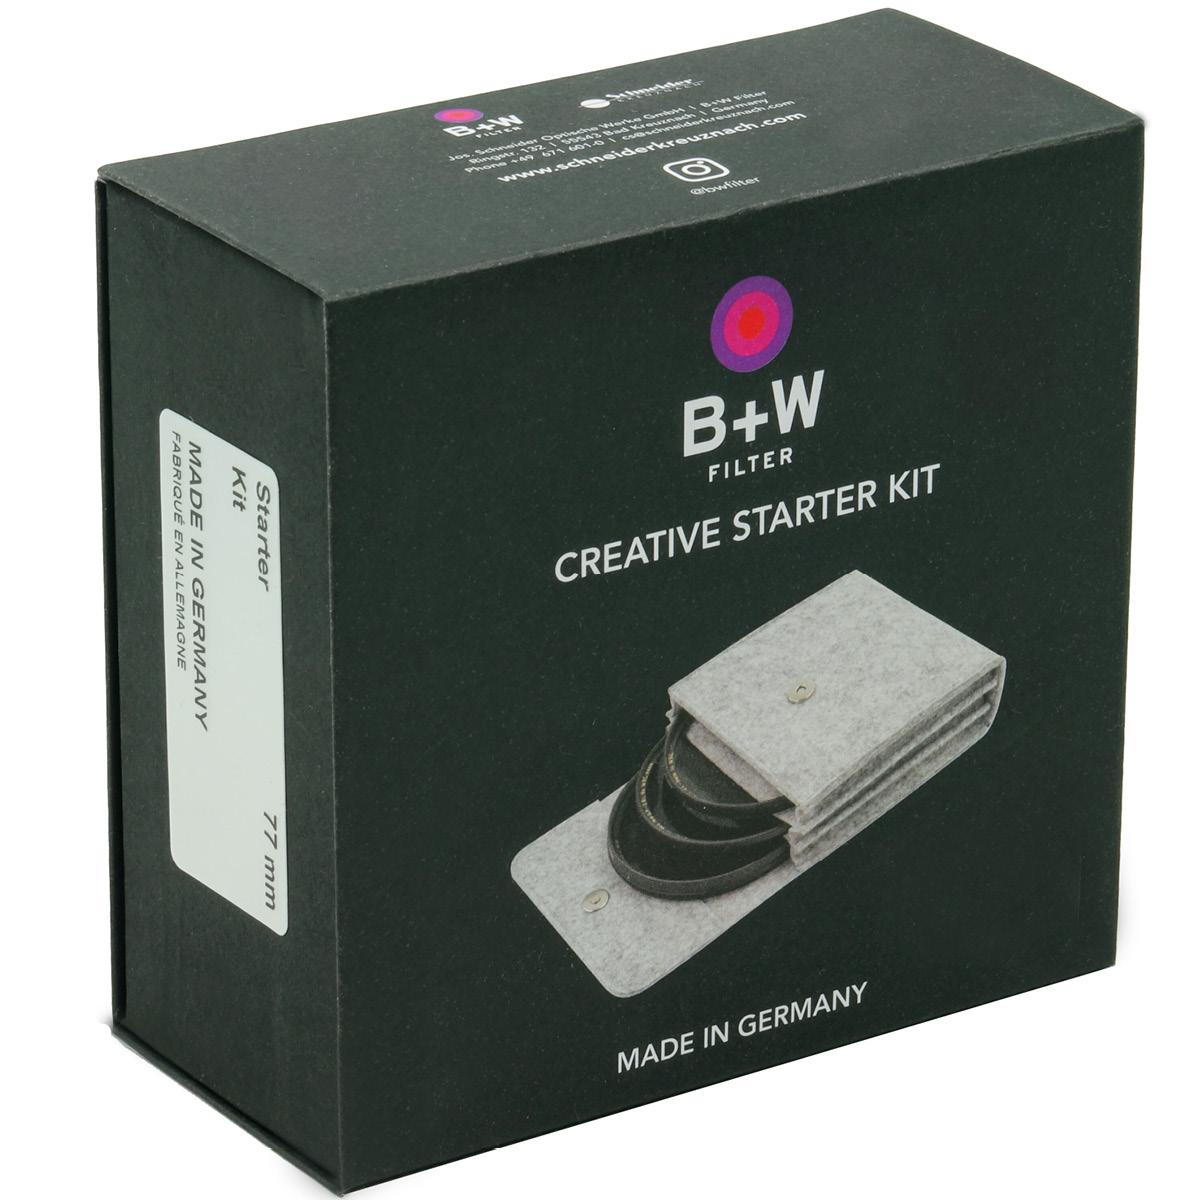 B+W Creative Starter Kit 37 mm